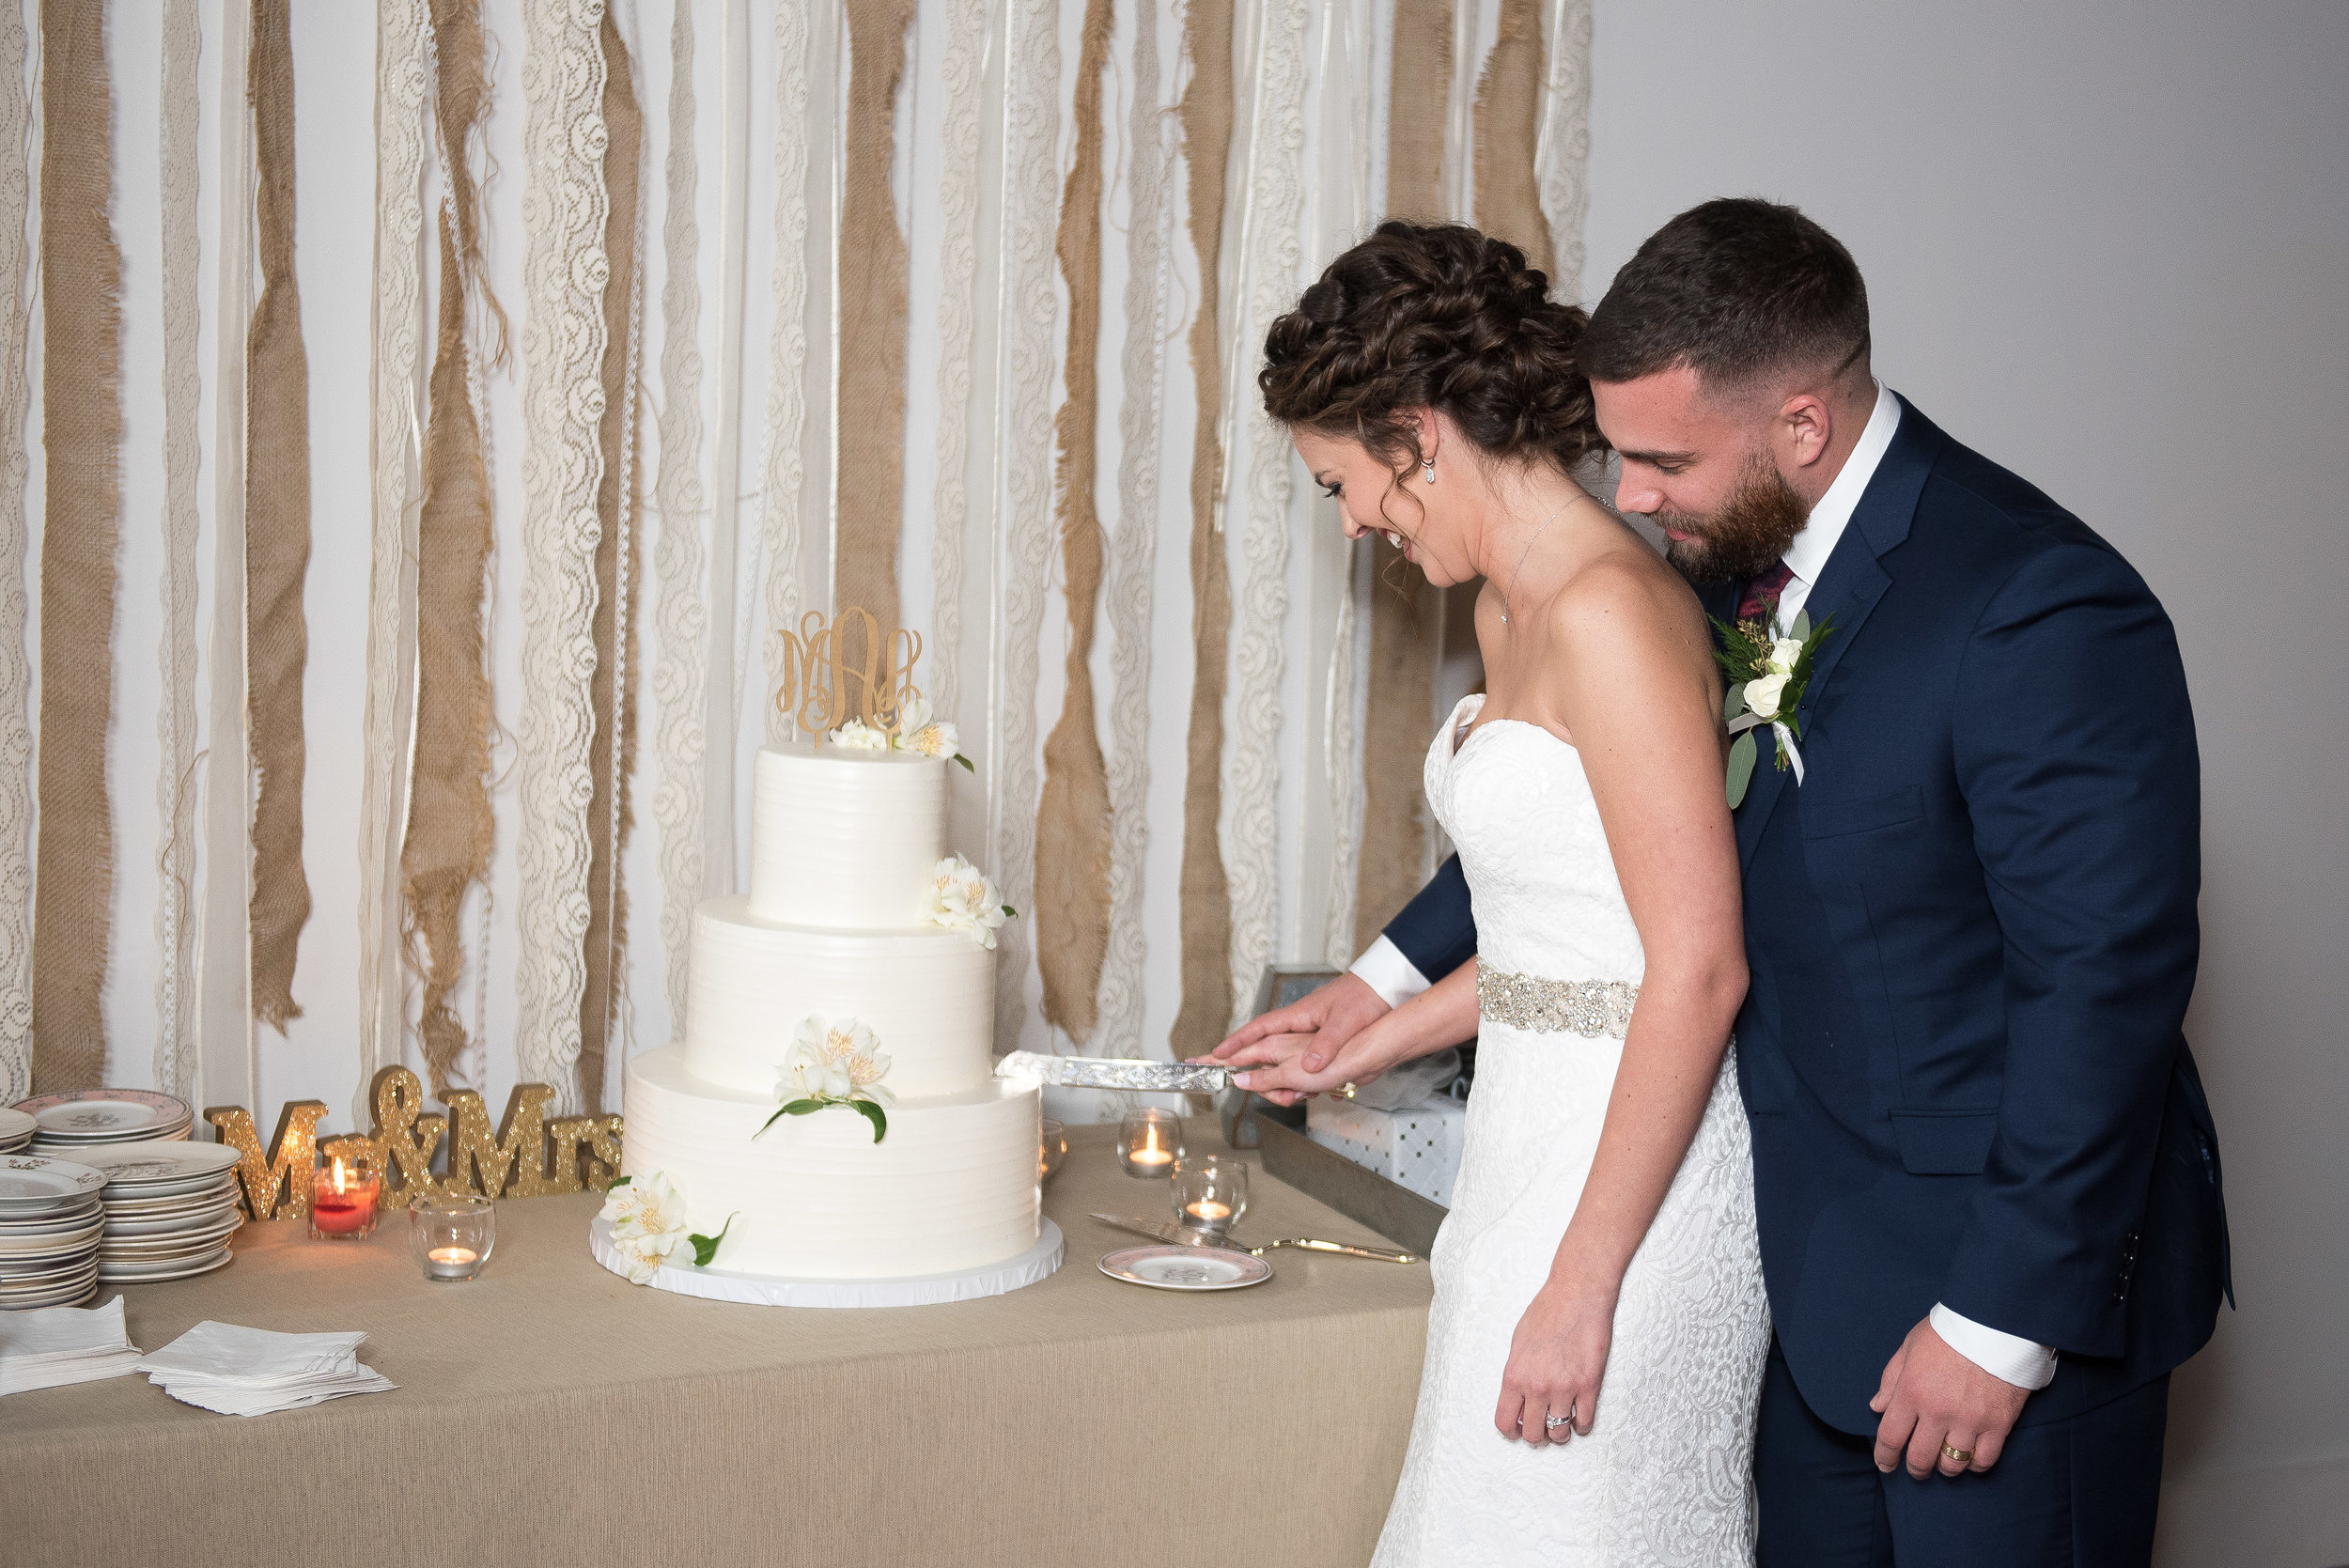 The Roller Mill Events - Winston Salem Weddings - NC Weddings - High Point NC Weddings - Winston Salem Venue - Yasmin Leonard Photography-73.jpg